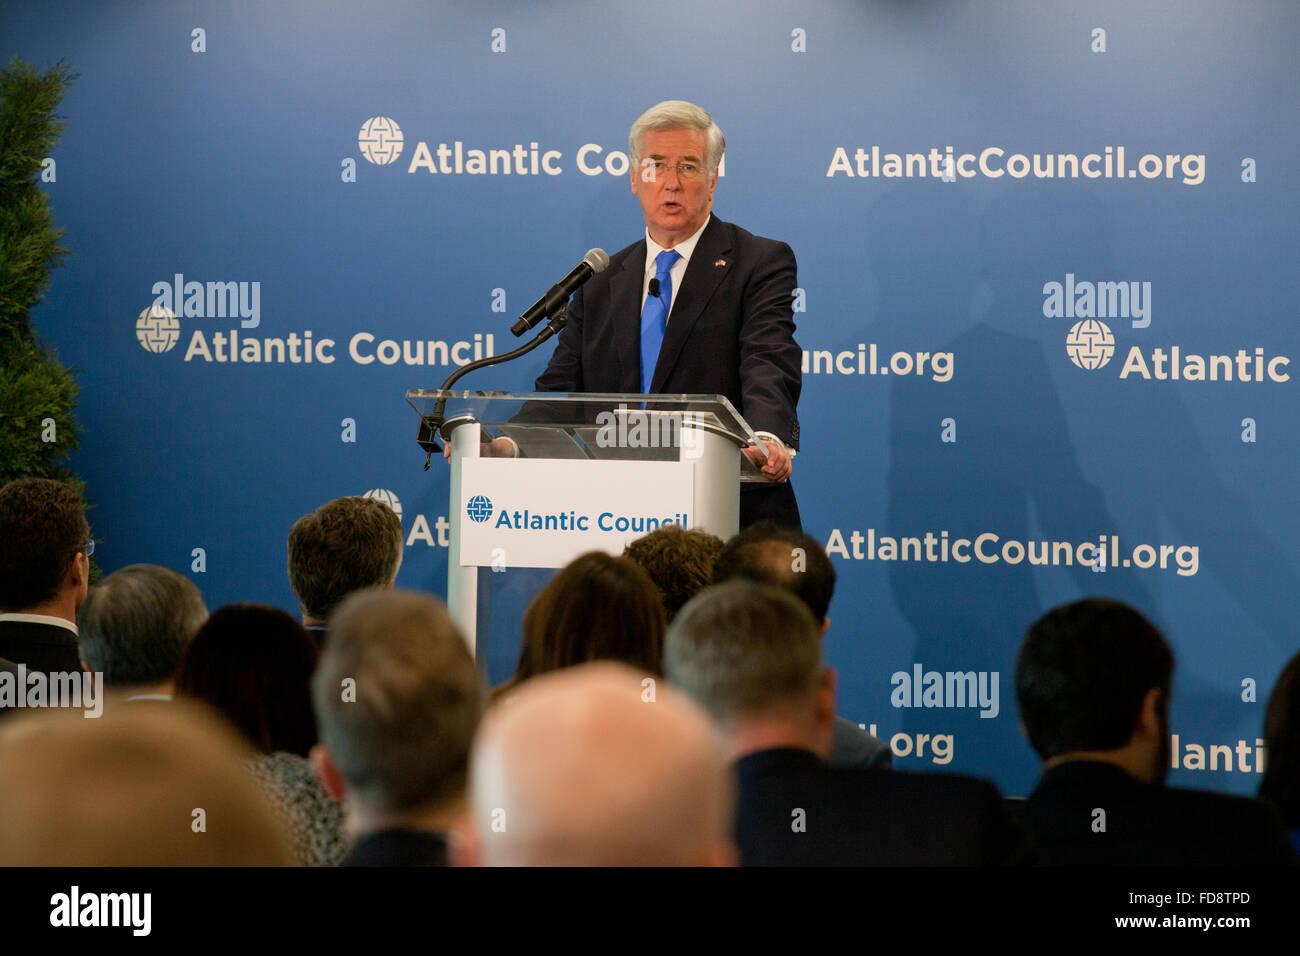 Michael Fallon MP for Sevenoaks (UK Secretary of State for Defense) speaking at Atlantic Council - Washington, DC - Stock Image